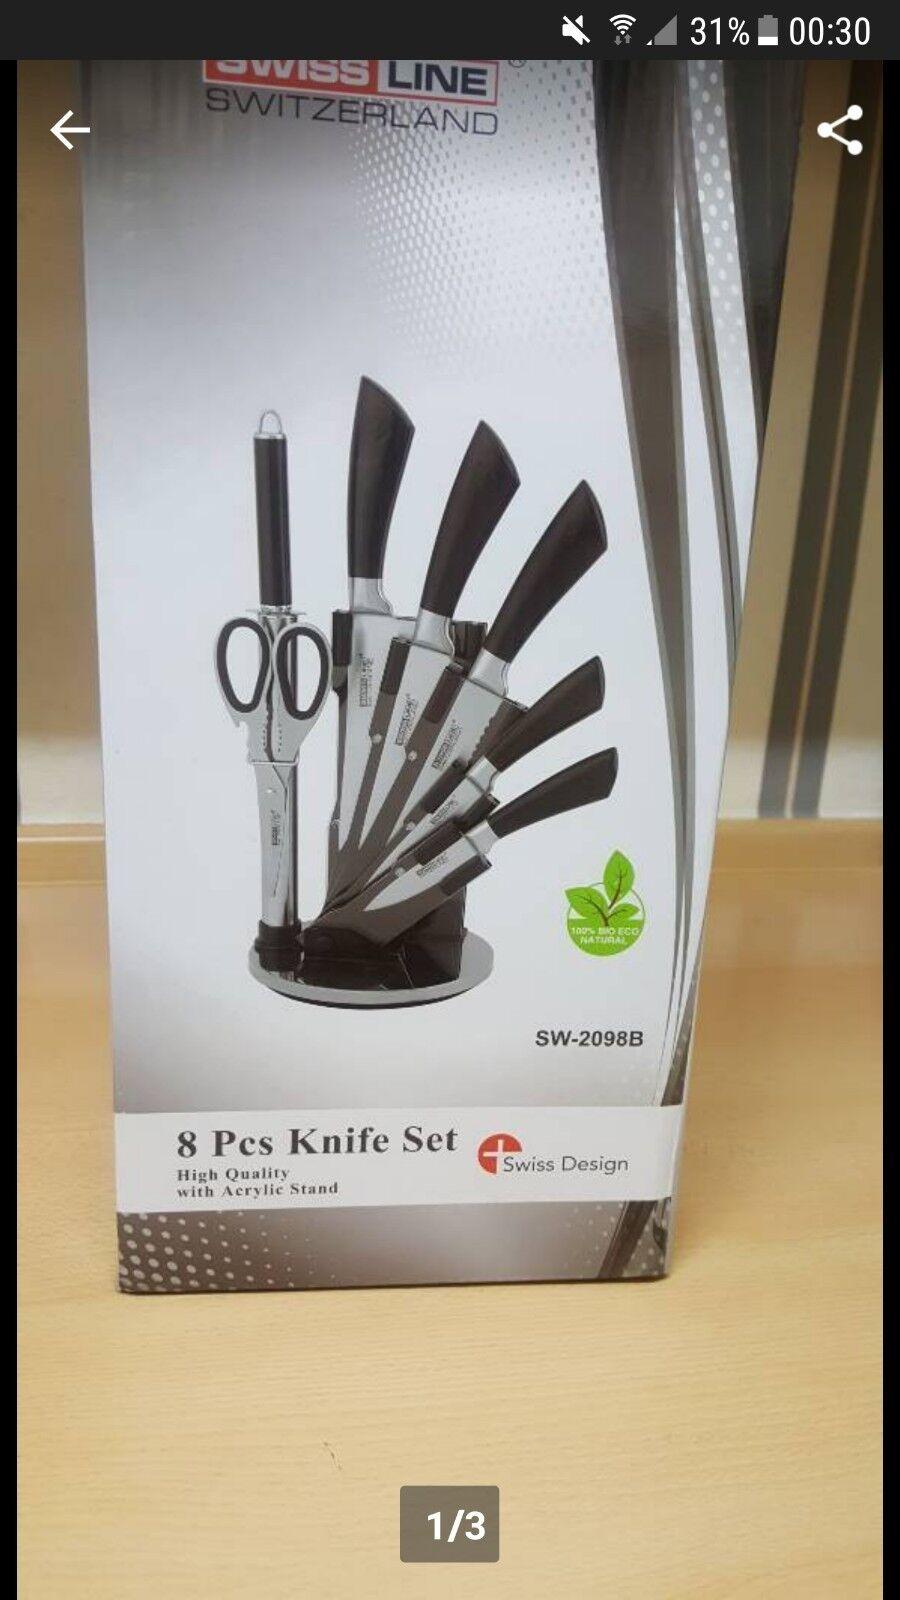 Messerset Messer hochwertig hochwertig hochwertig  NEU 100%BioEcoNatural e42260